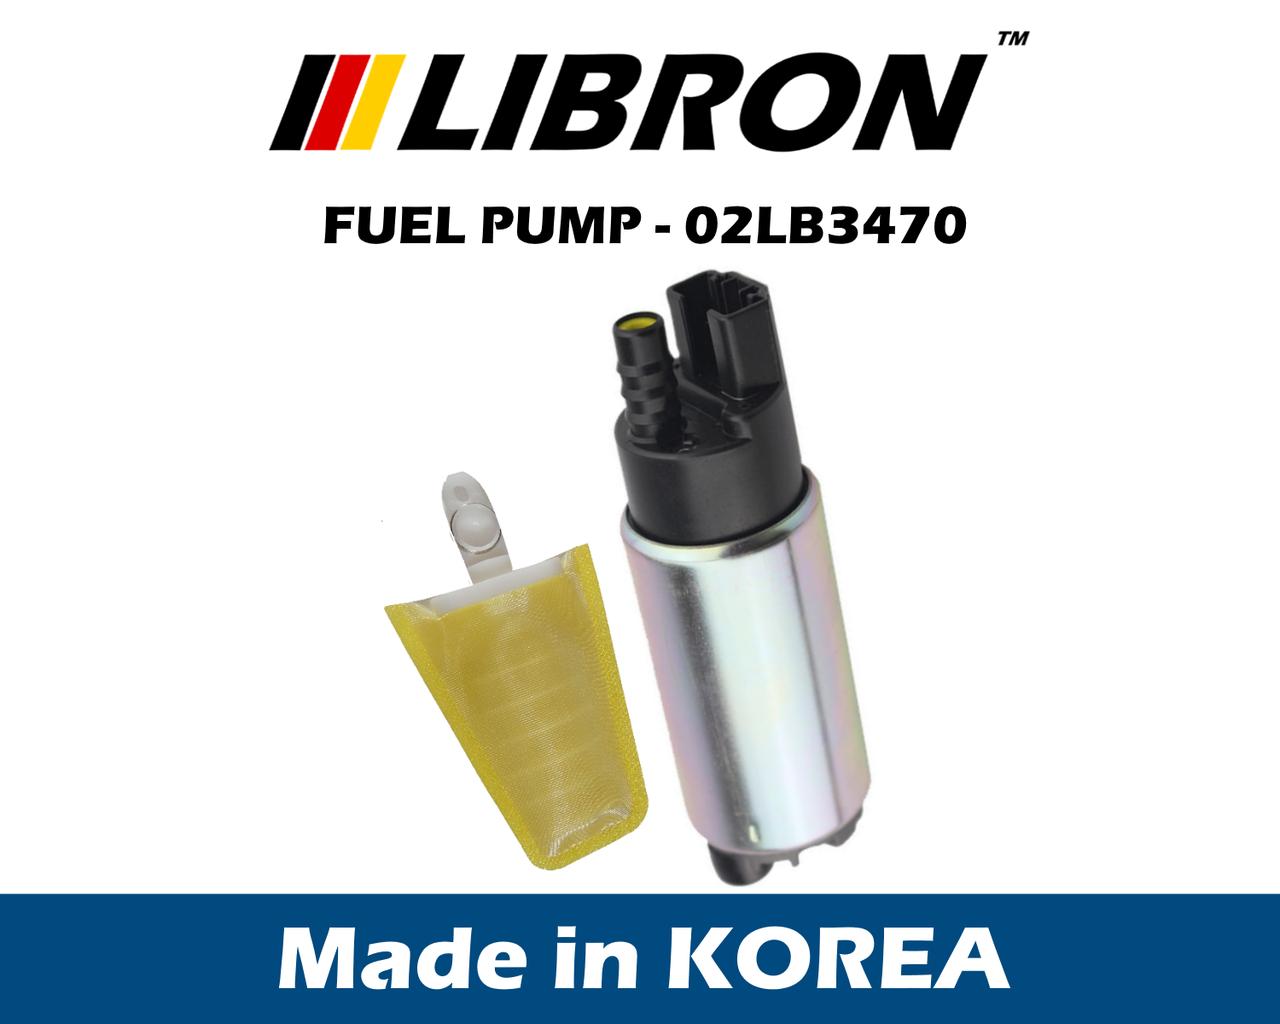 Топливный насос LIBRON 02LB3470 - JEEP CHEROKEE (2001-2008)